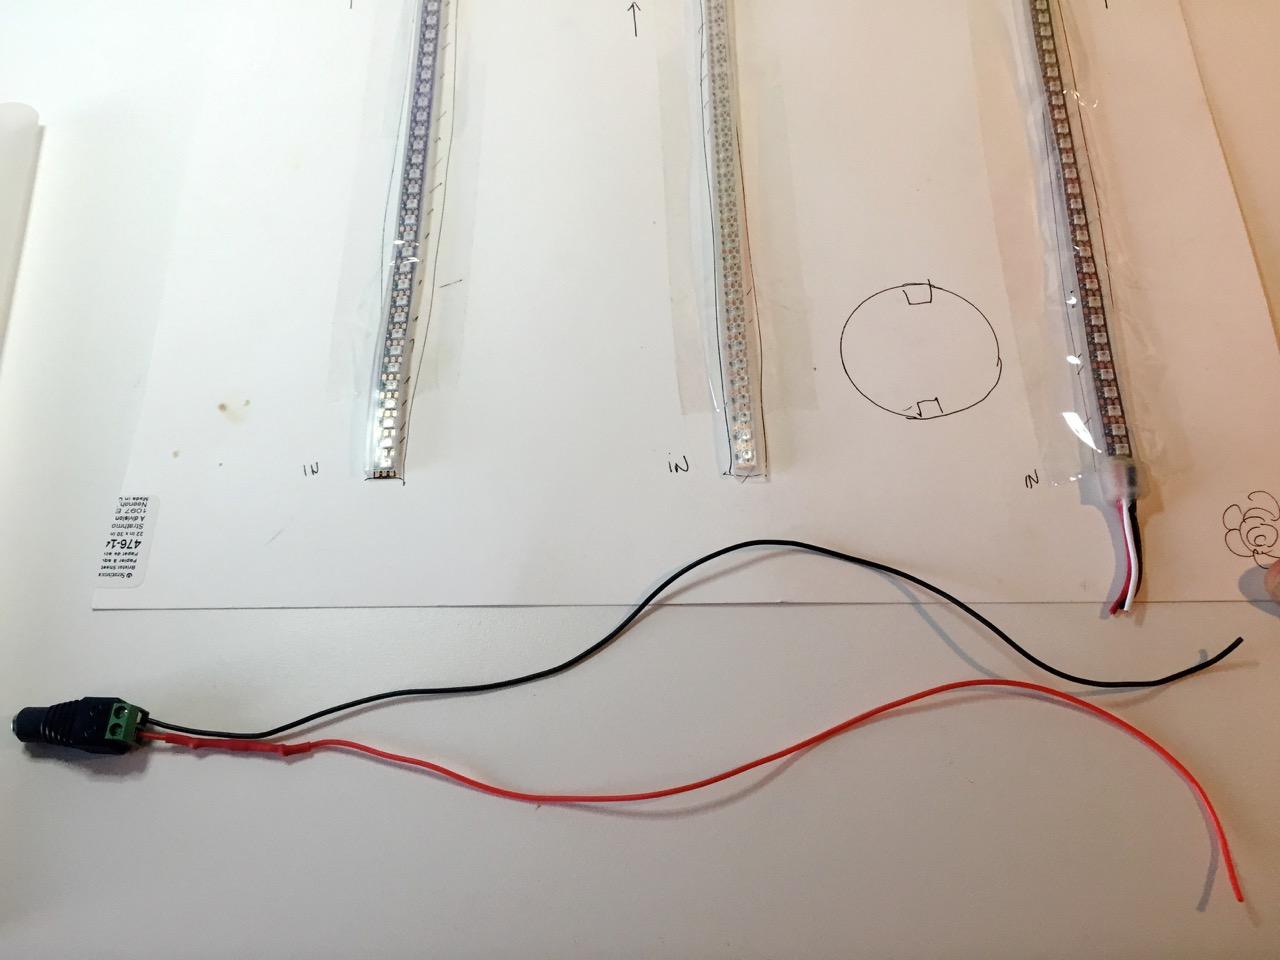 led_strips_07_measurewires.jpg